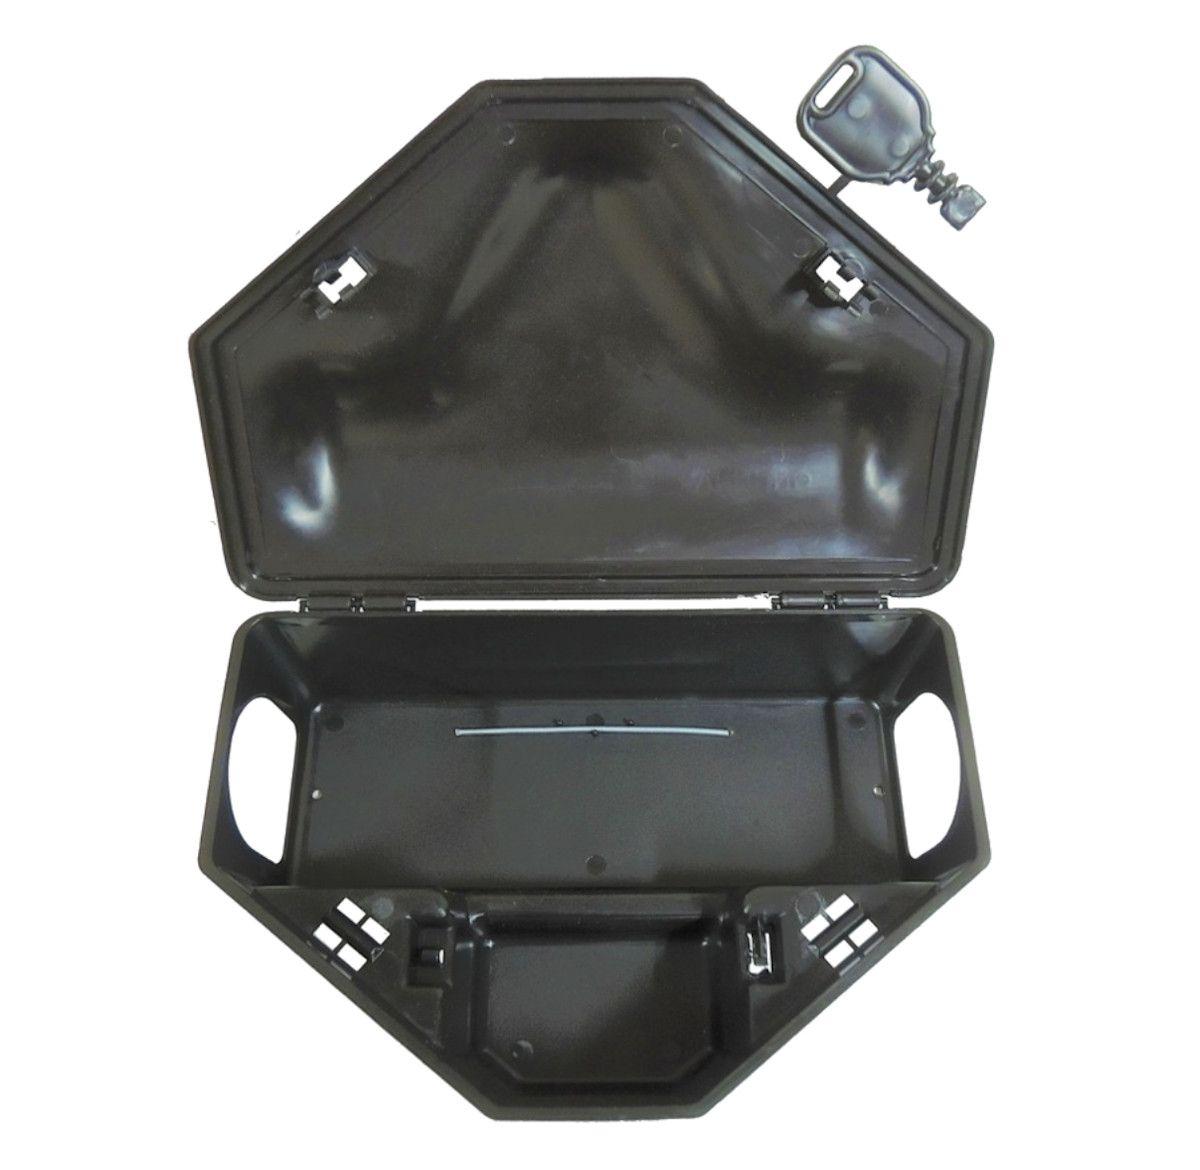 Kit 32 Porta Isca C/2 Chaves + 32 Bloco Extrusado Mata Seca